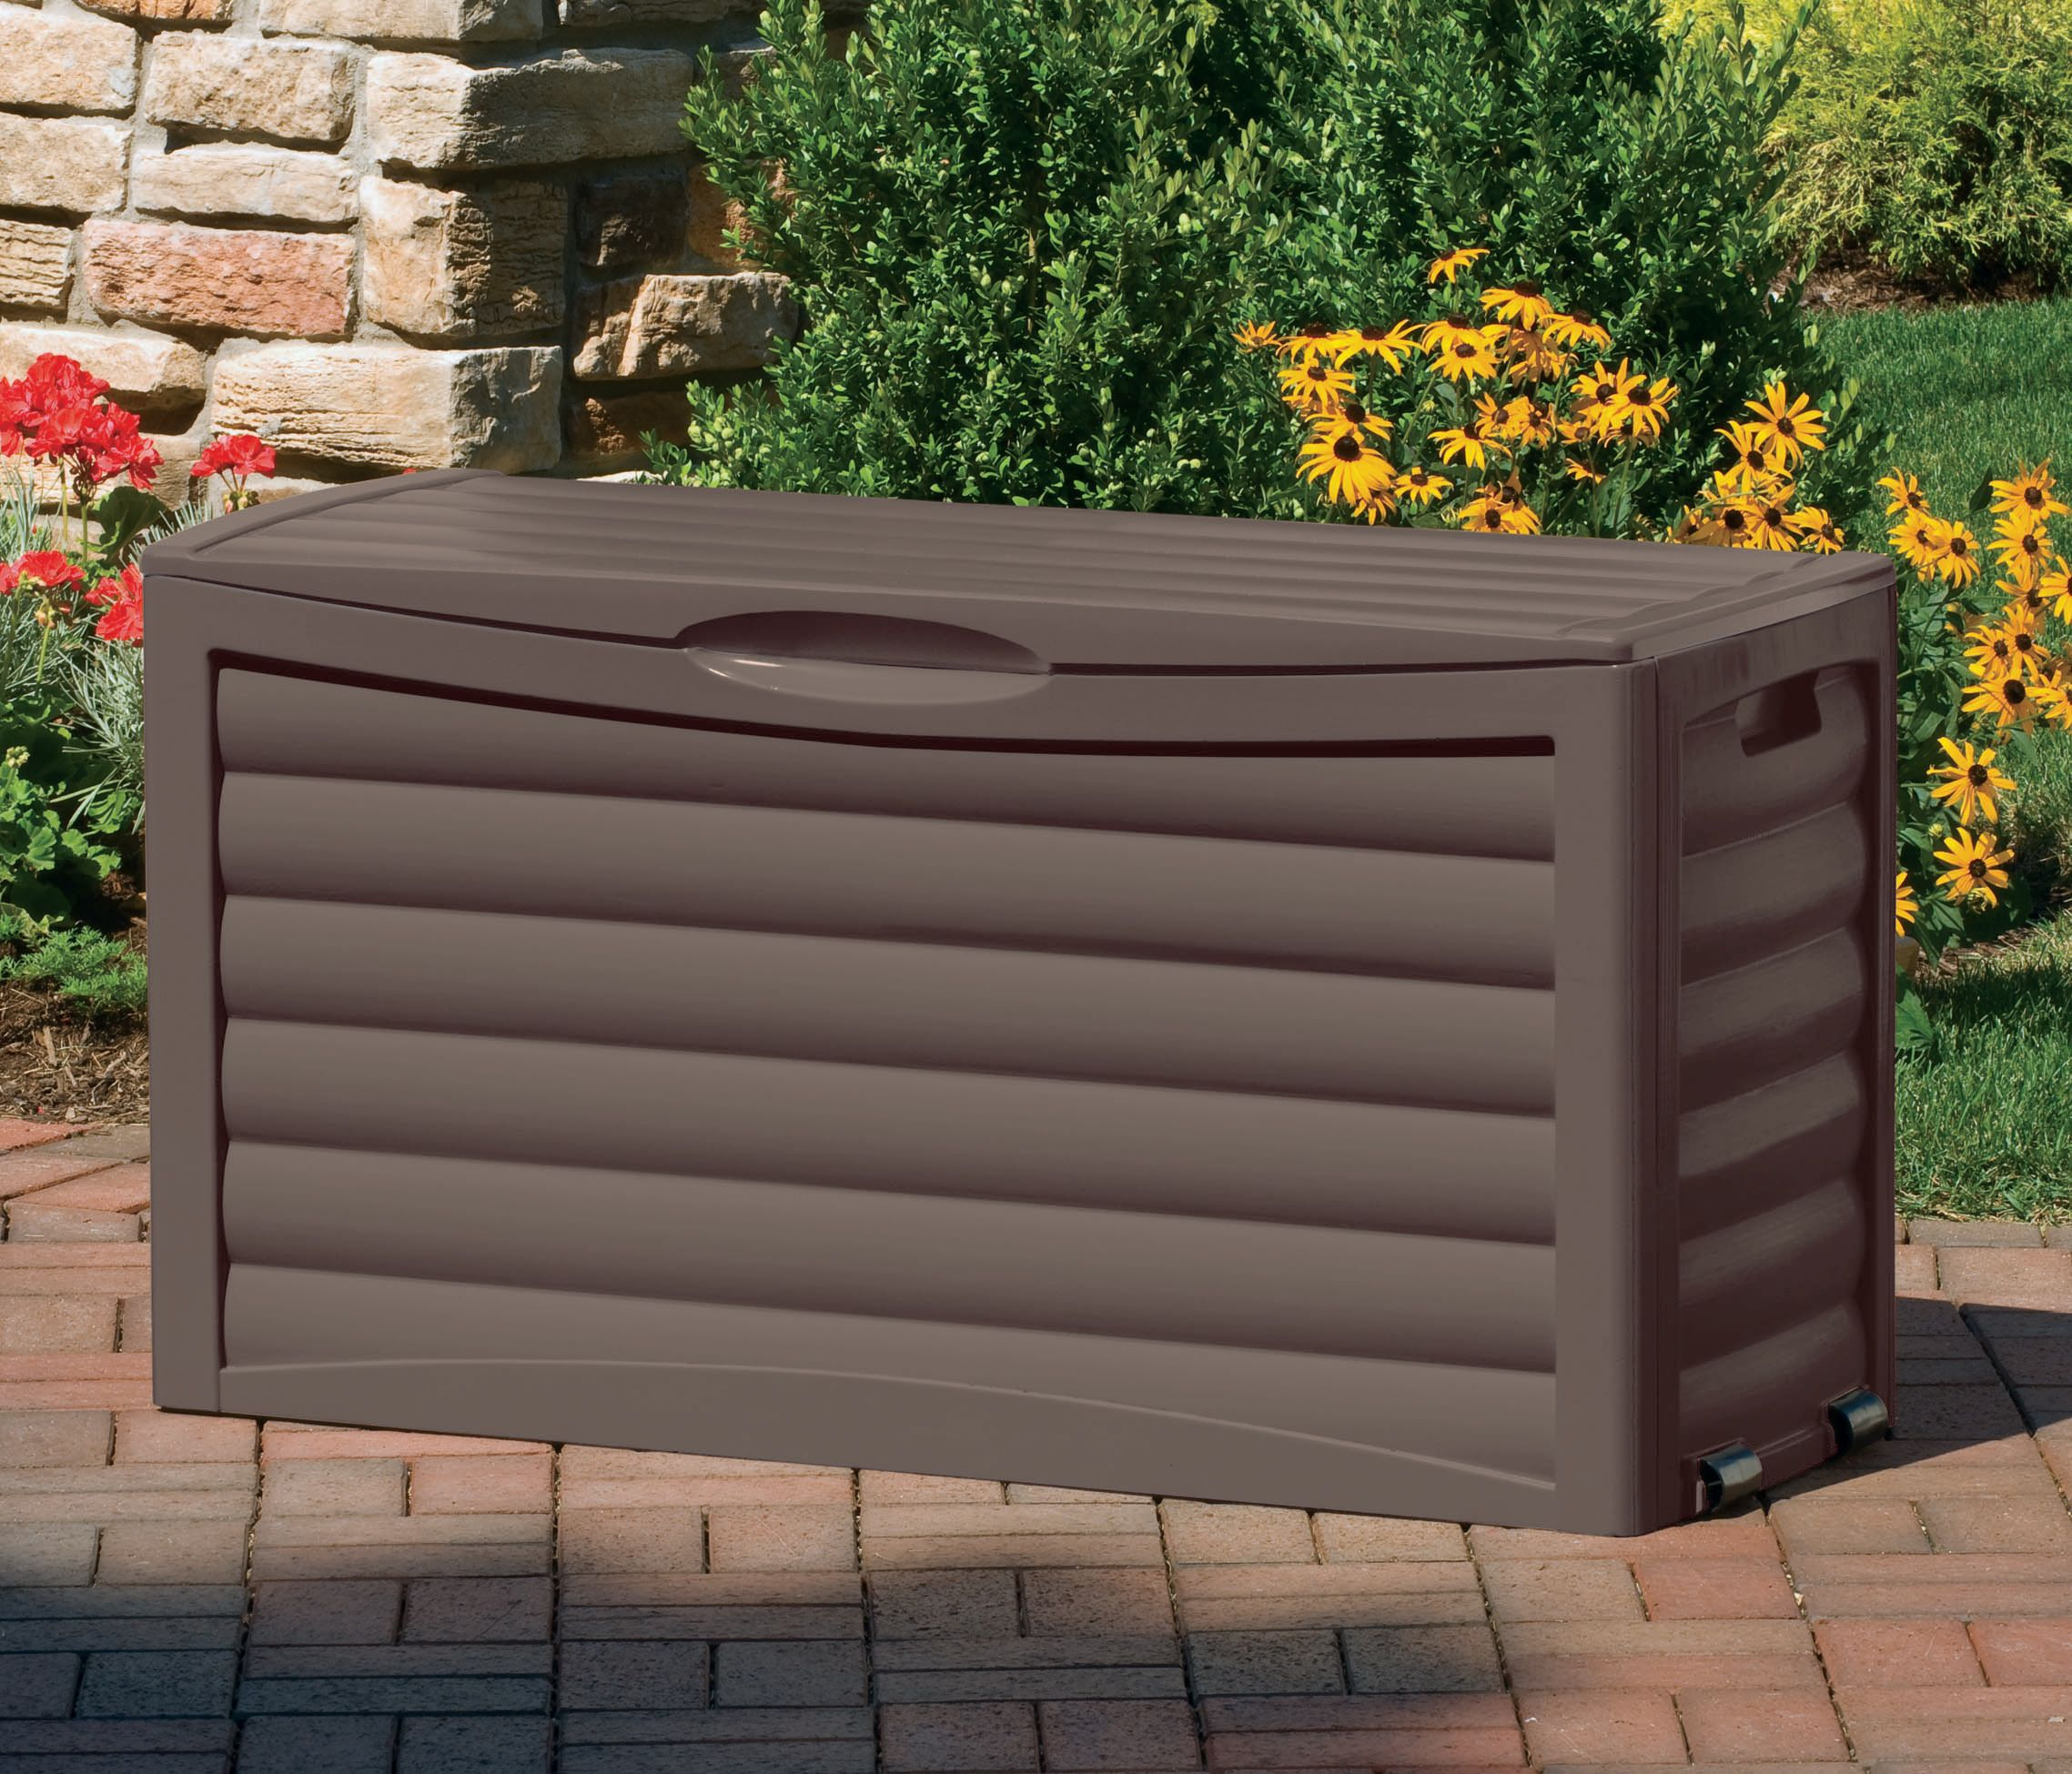 Suncast Patio Storage Box